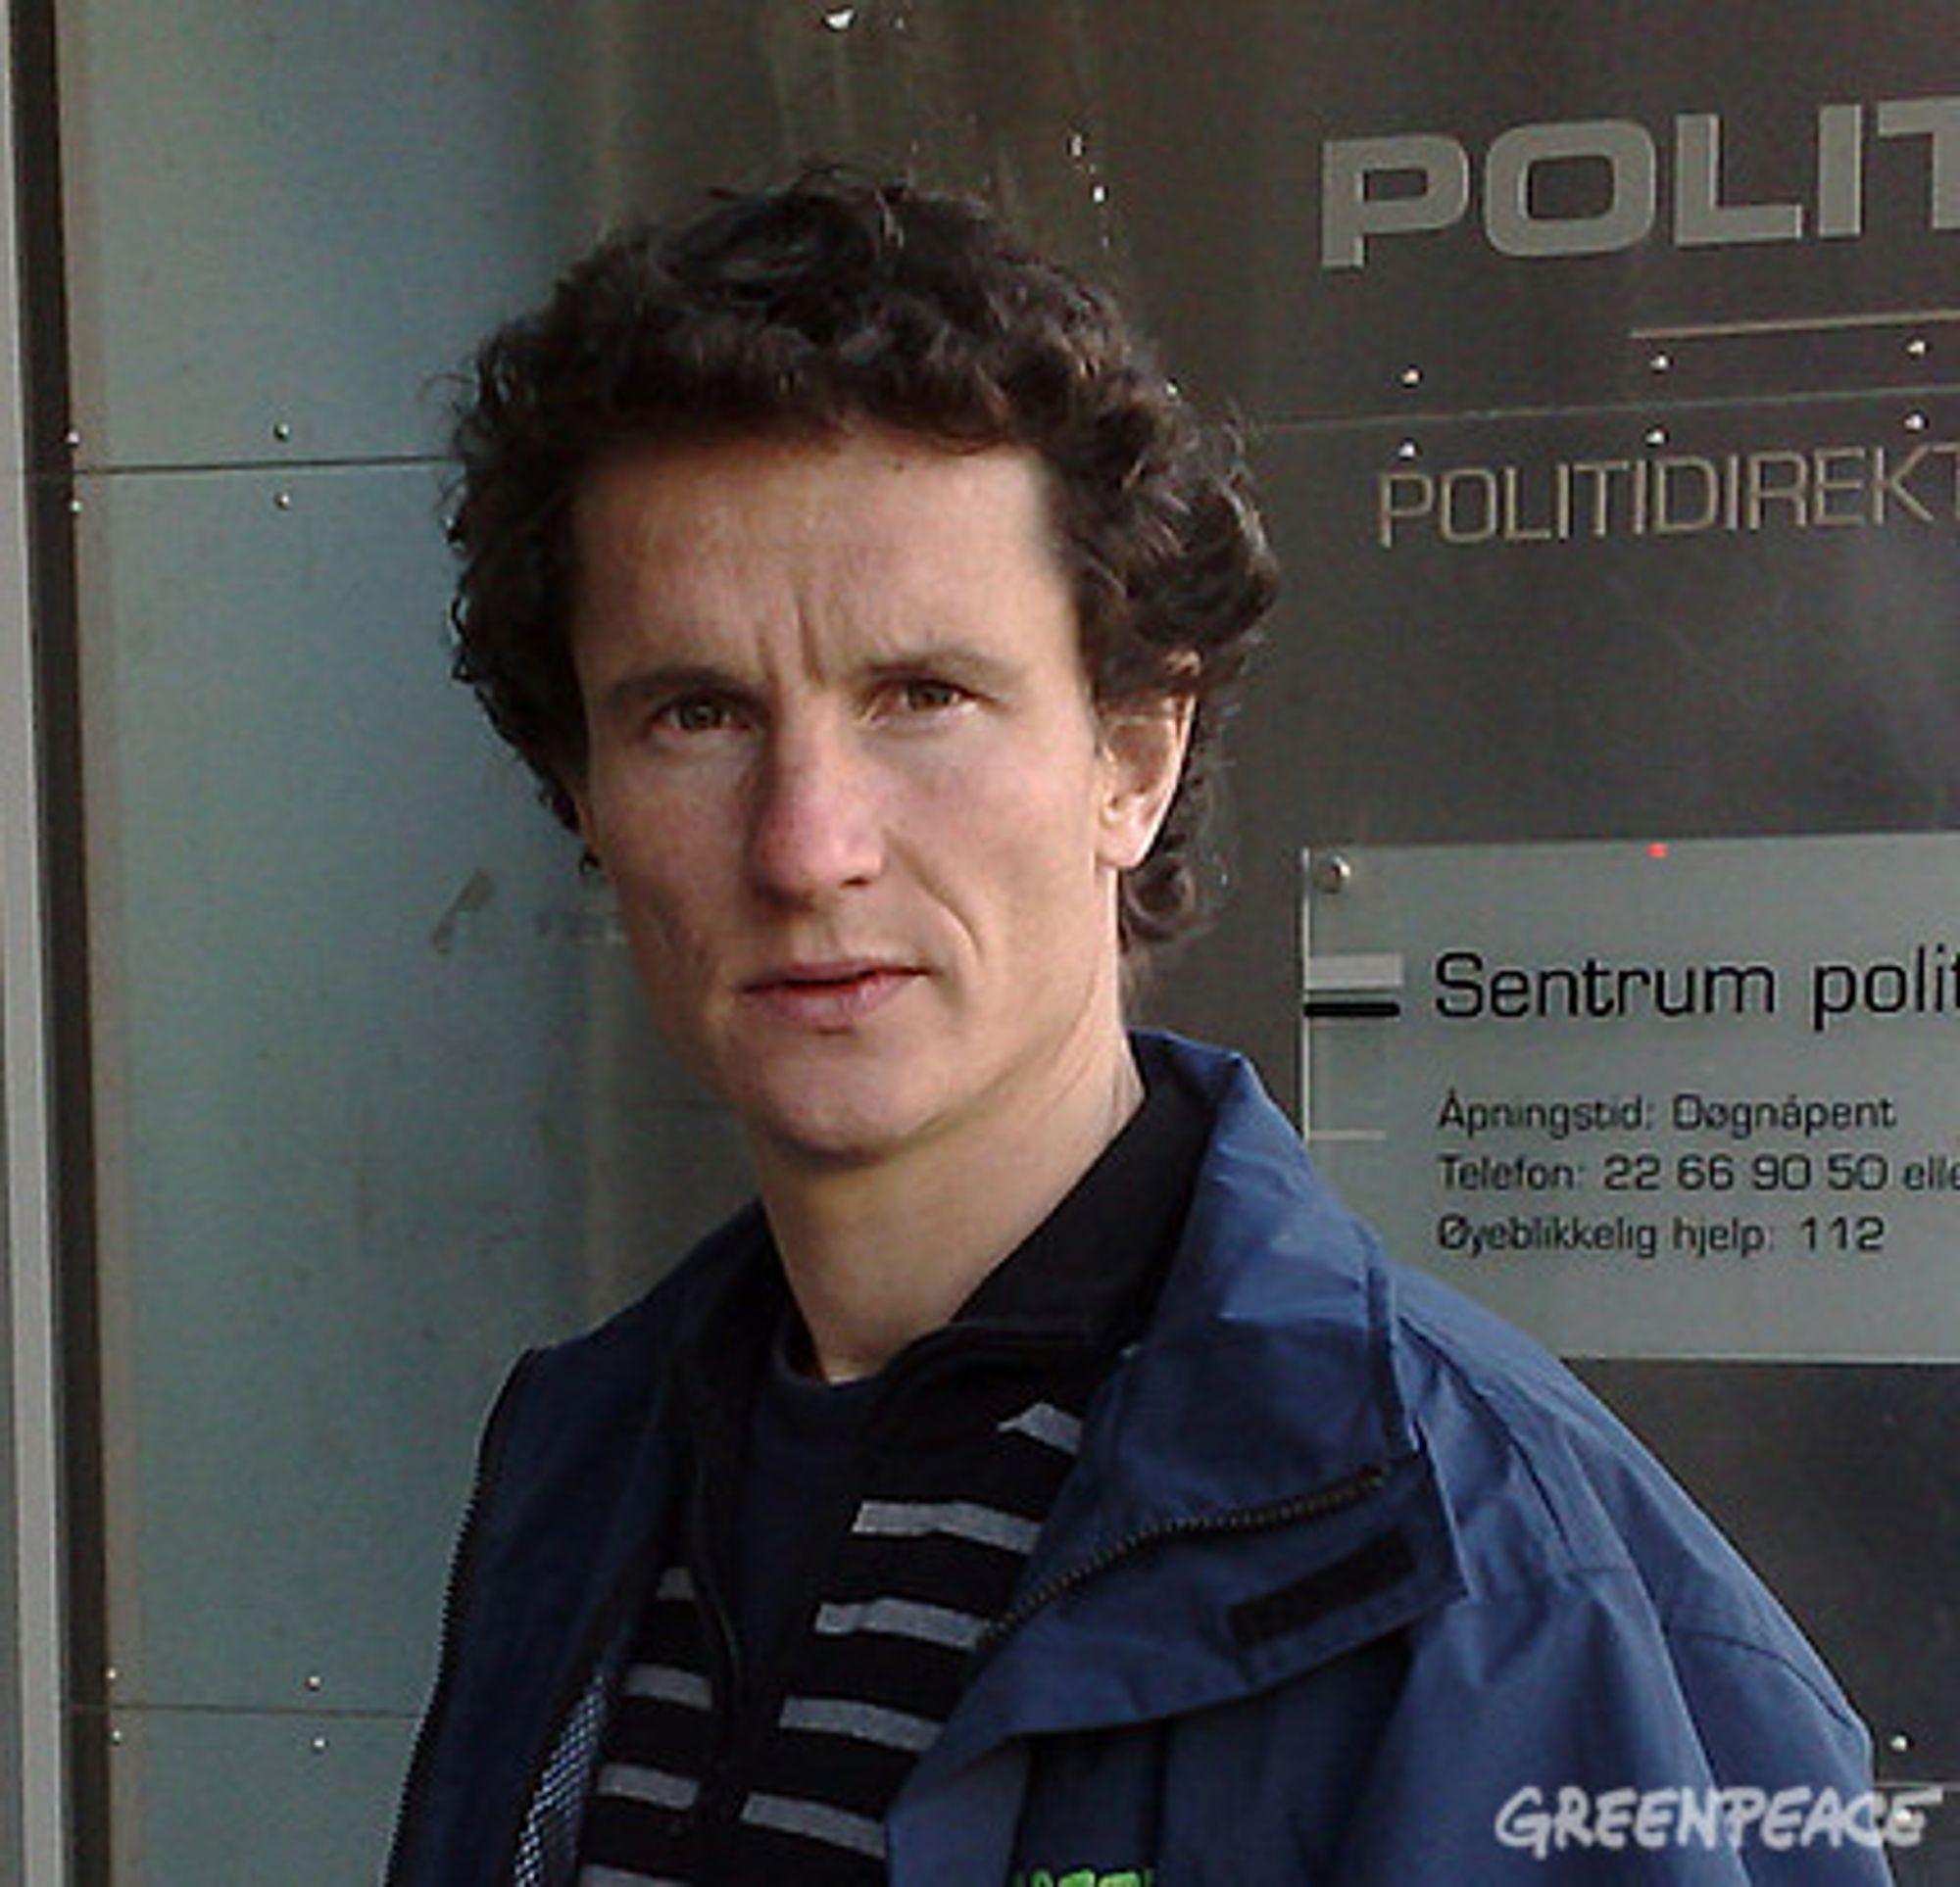 Lederen i Greenpeace Norge, Truls Gulowsen.